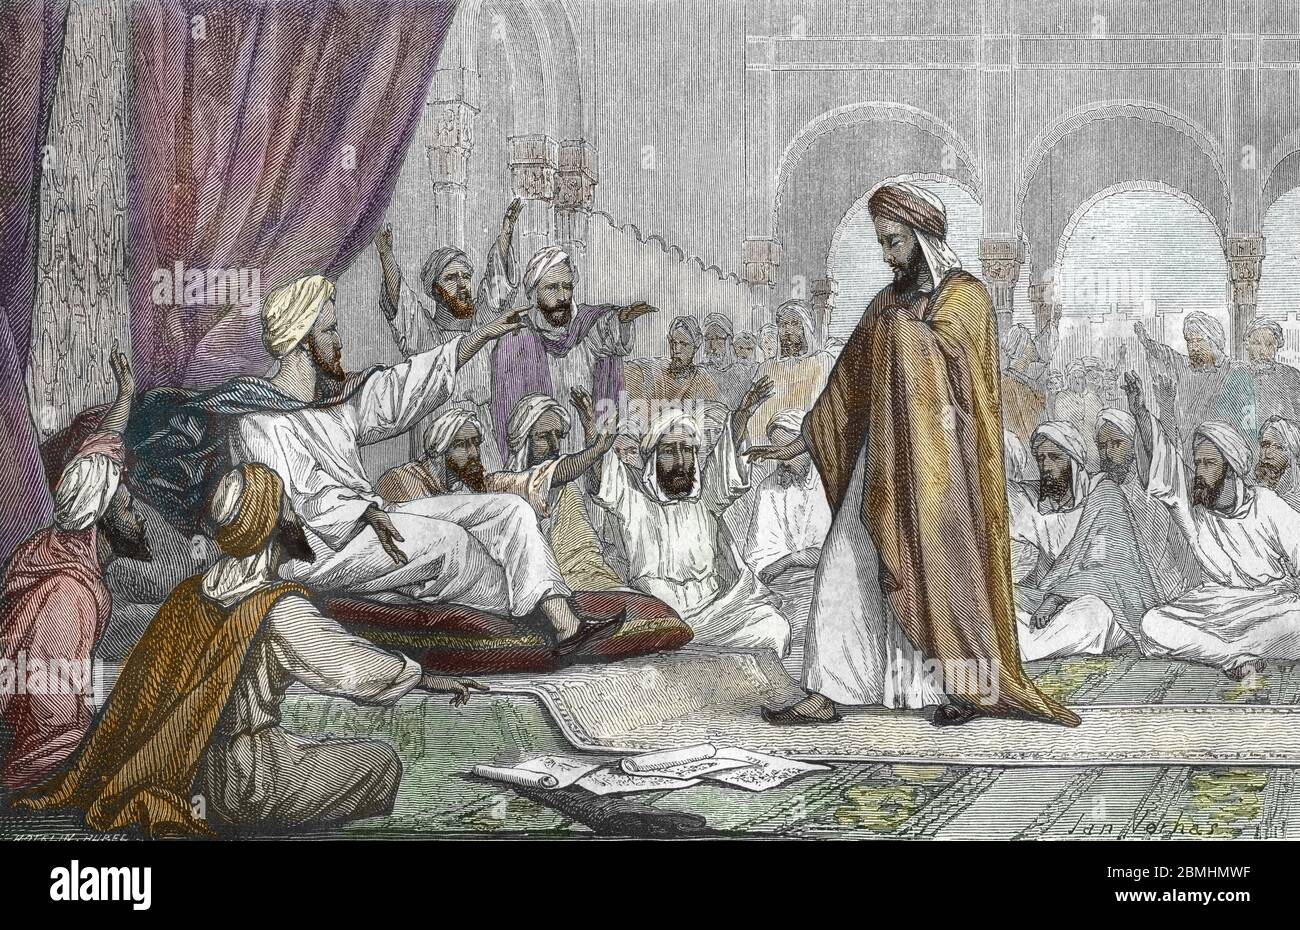 """Representation du philosophe, theologien rationaliste islamique, juriste, mathematicien et medecin musulman andalou Averroes (1126-1198) (Ibn Rochd d Stock Photo"